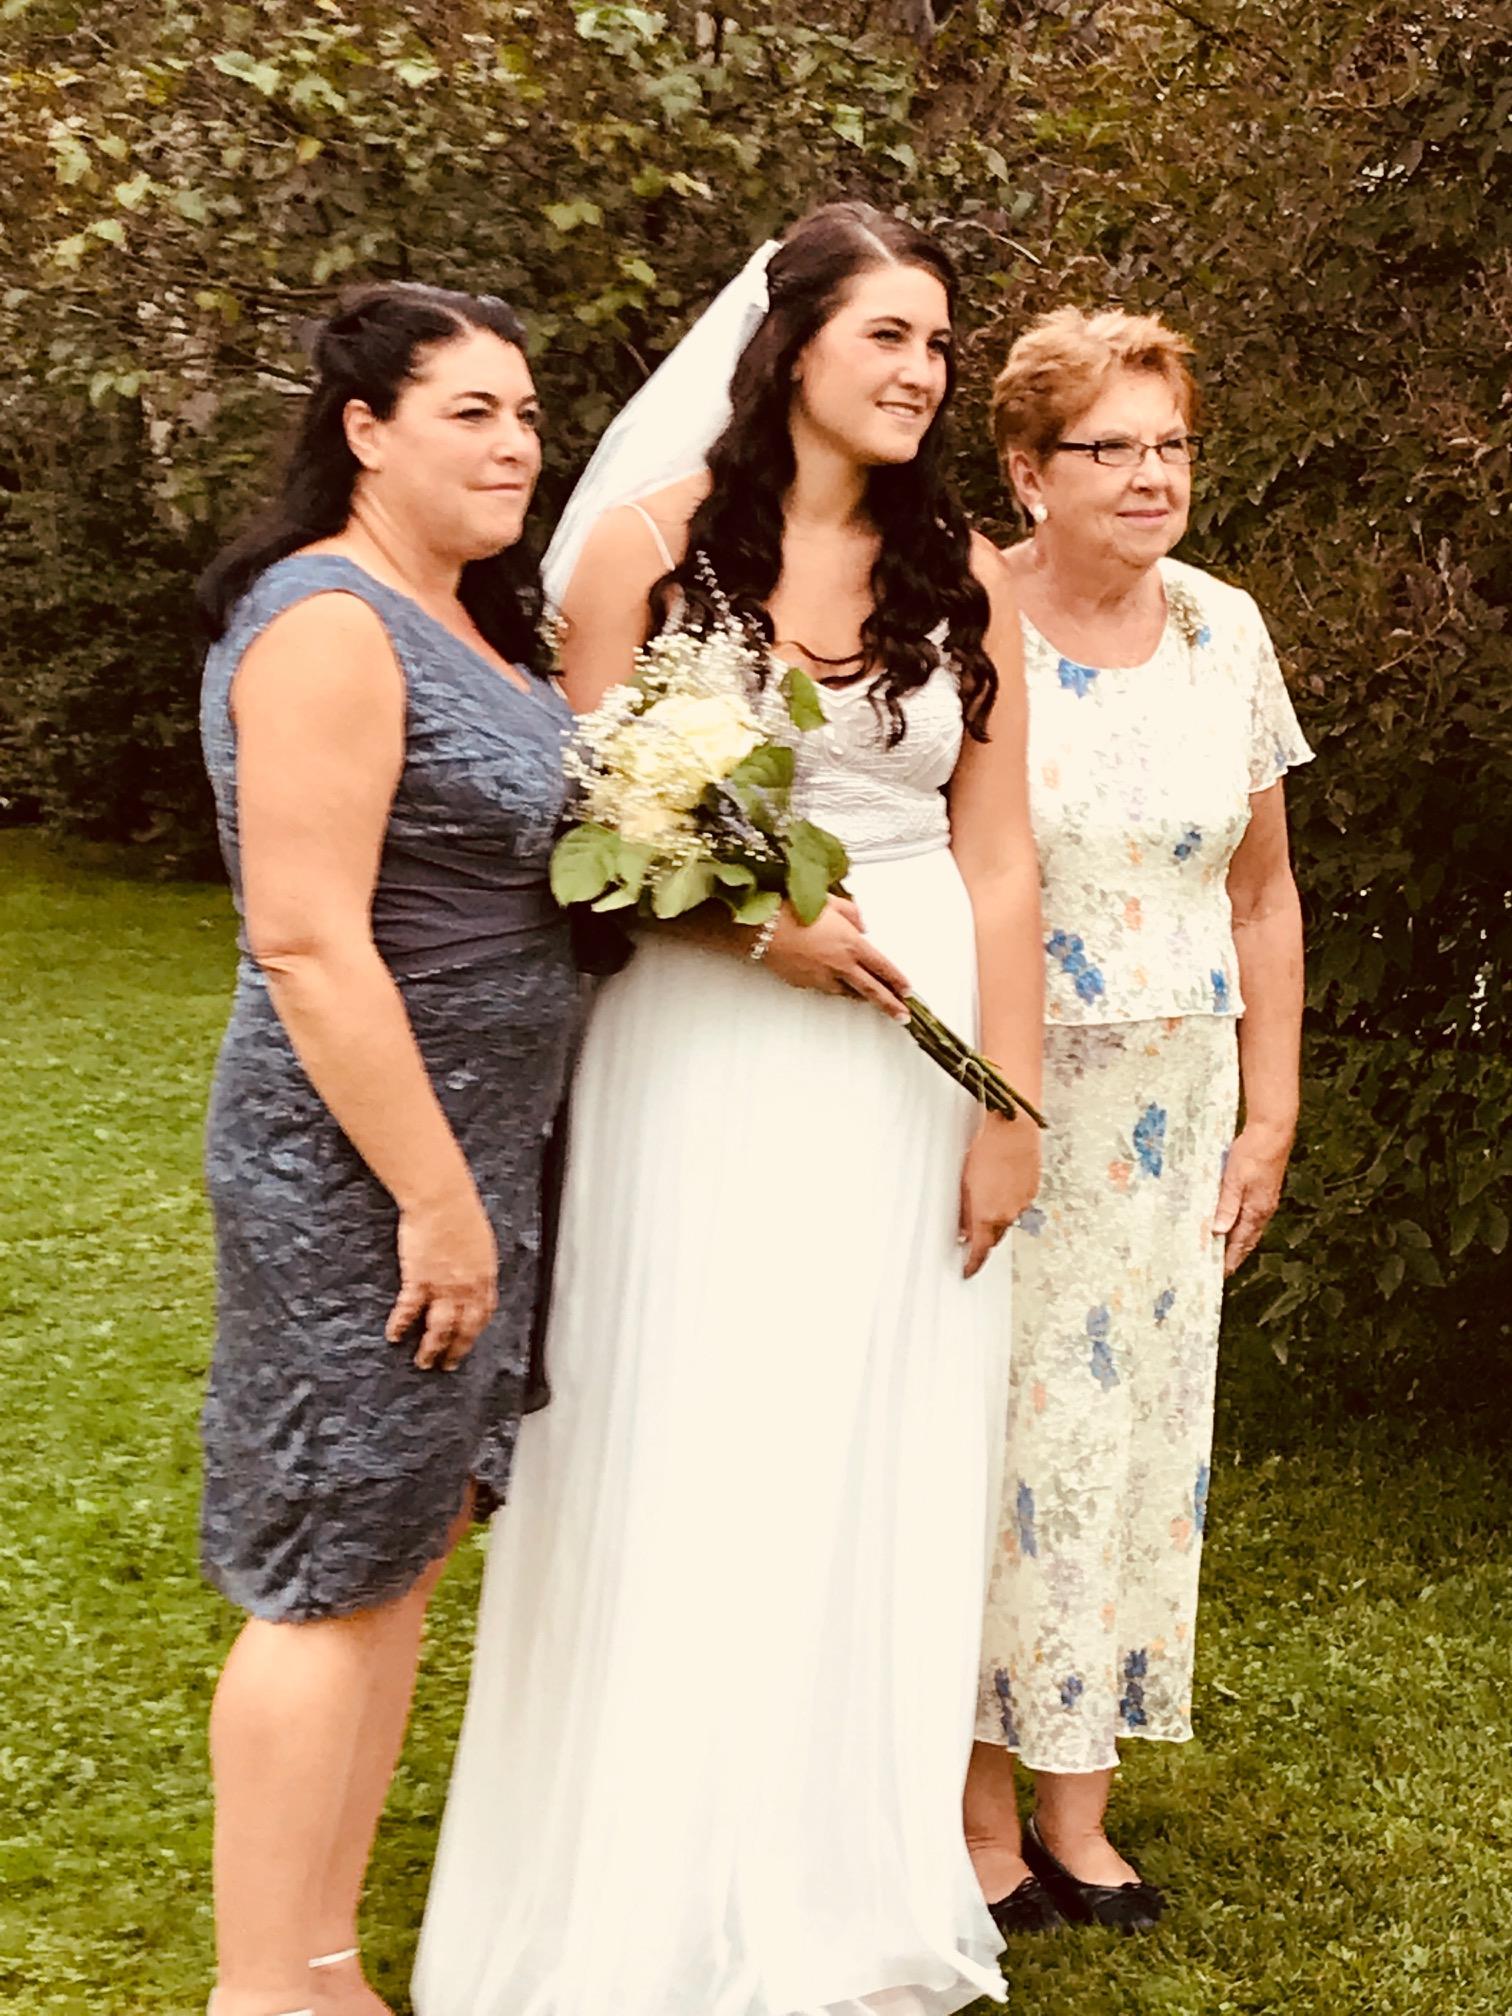 Sister Robin, Niece Taylor, Mother Linda